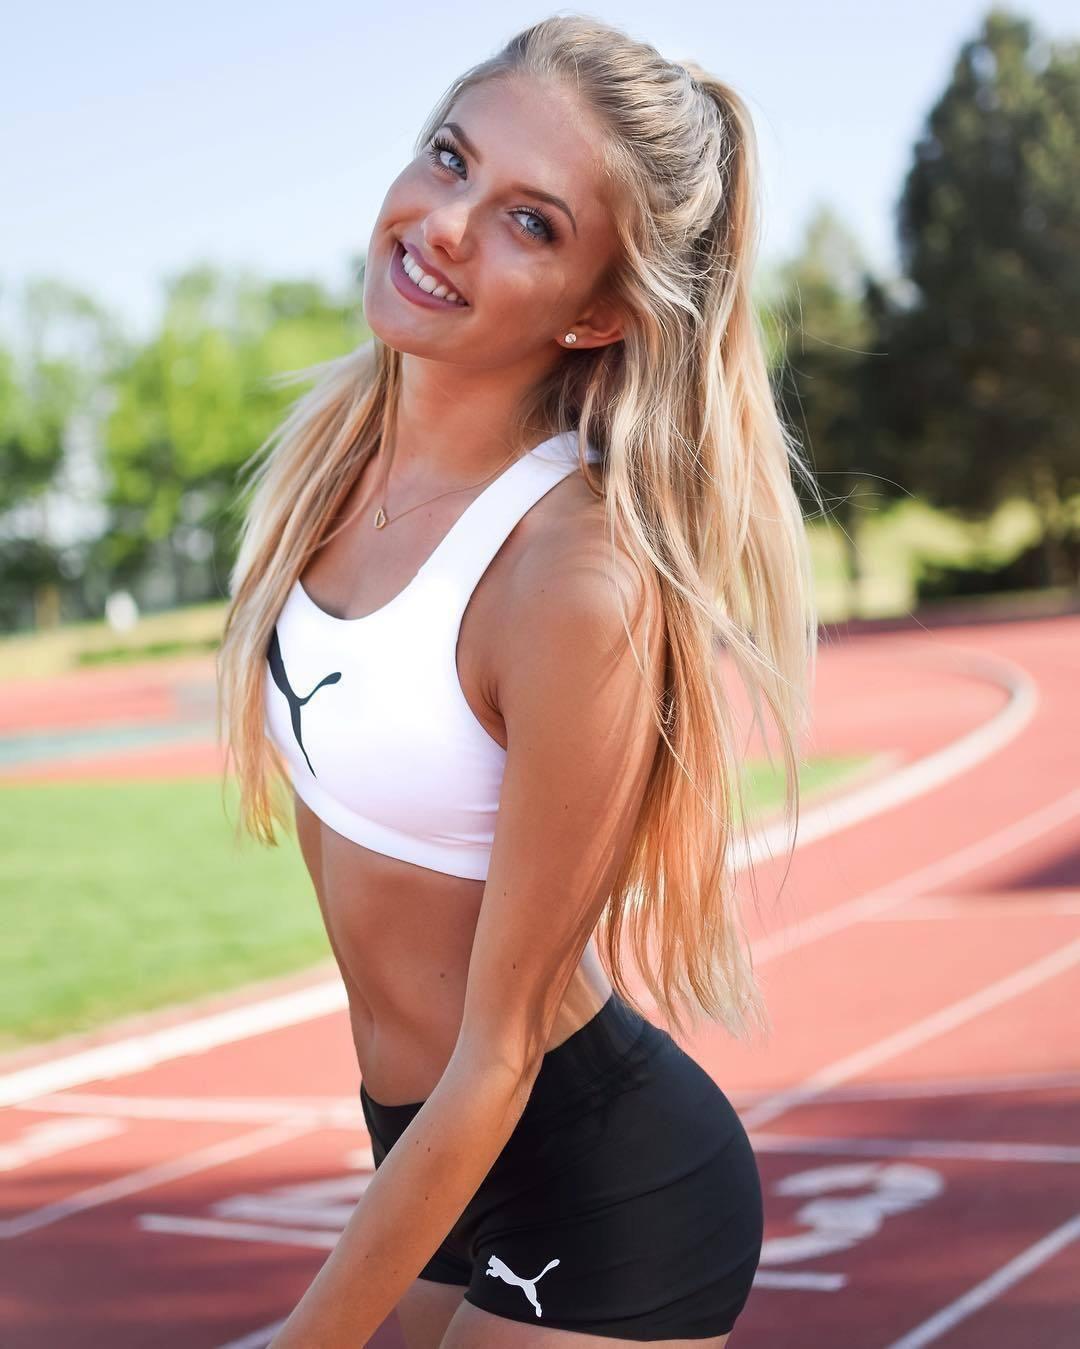 Alica Schmidt Alicasmd Sporty Girls Girls Run The World